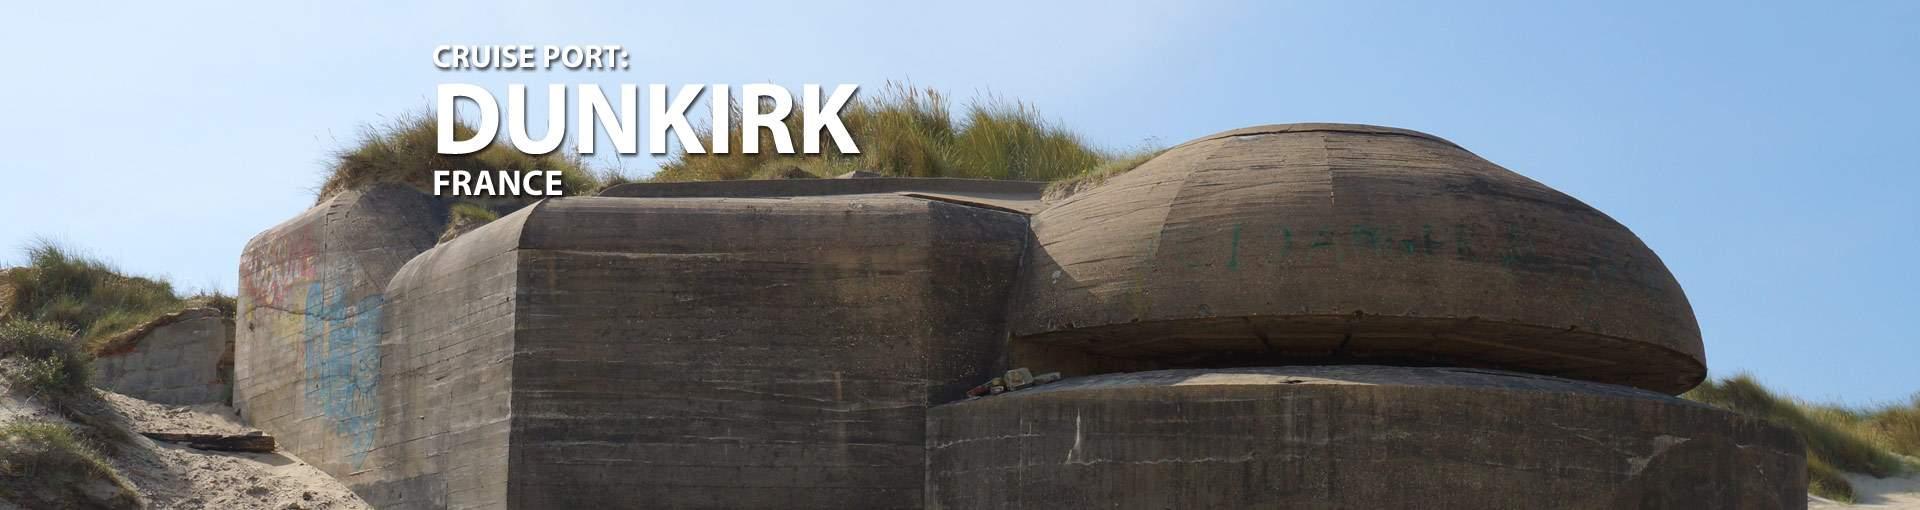 Dunkirk, France Cruise Port